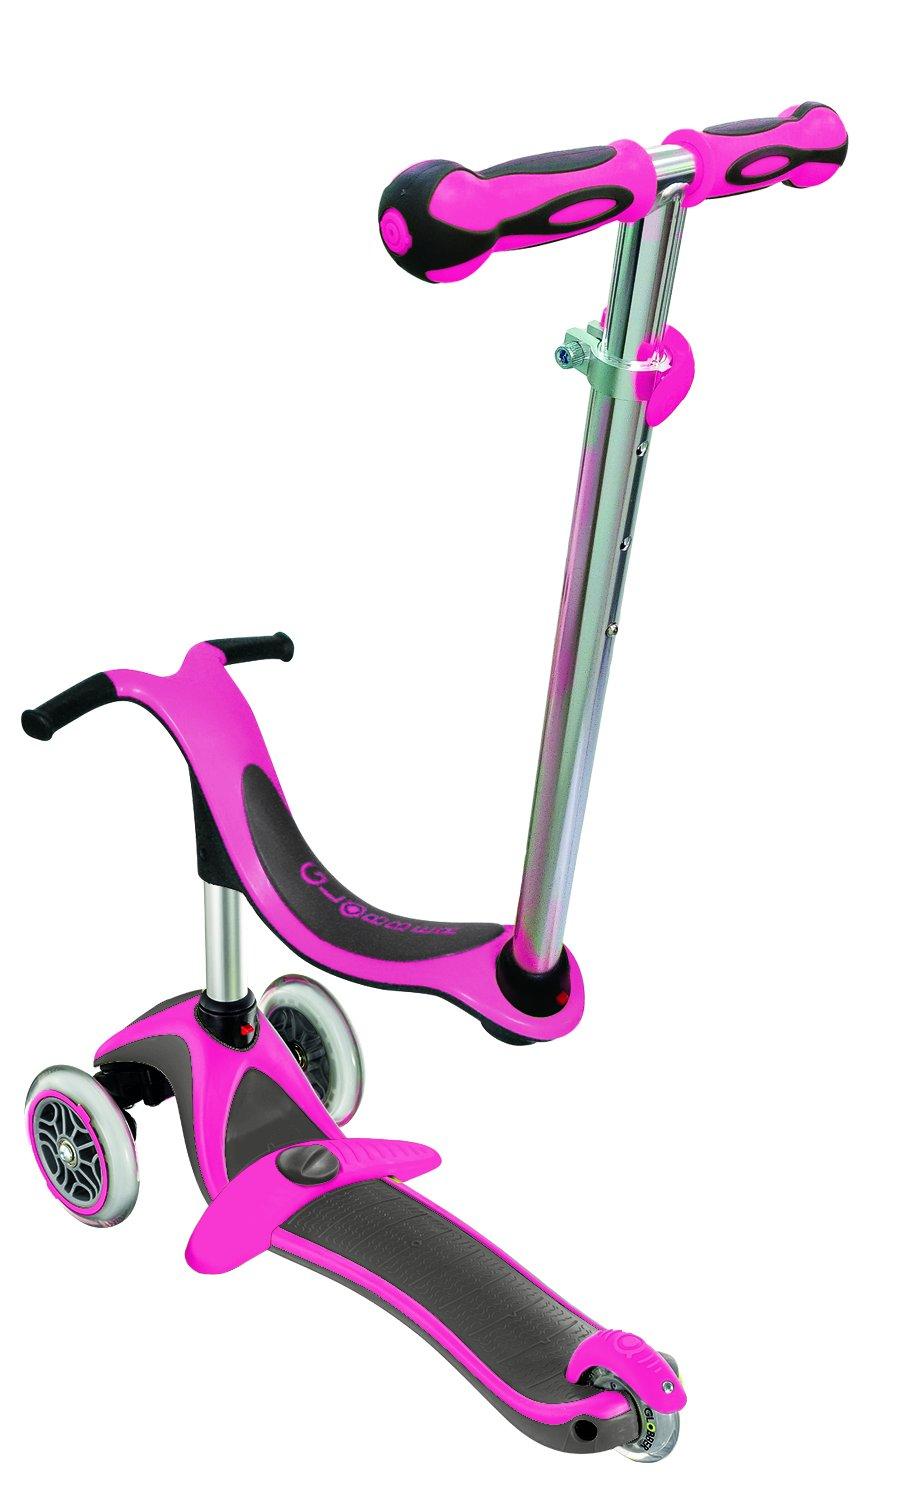 Amazon.com : Globber Evo 4 in 1 Plus 453-132 Neon Pink ...